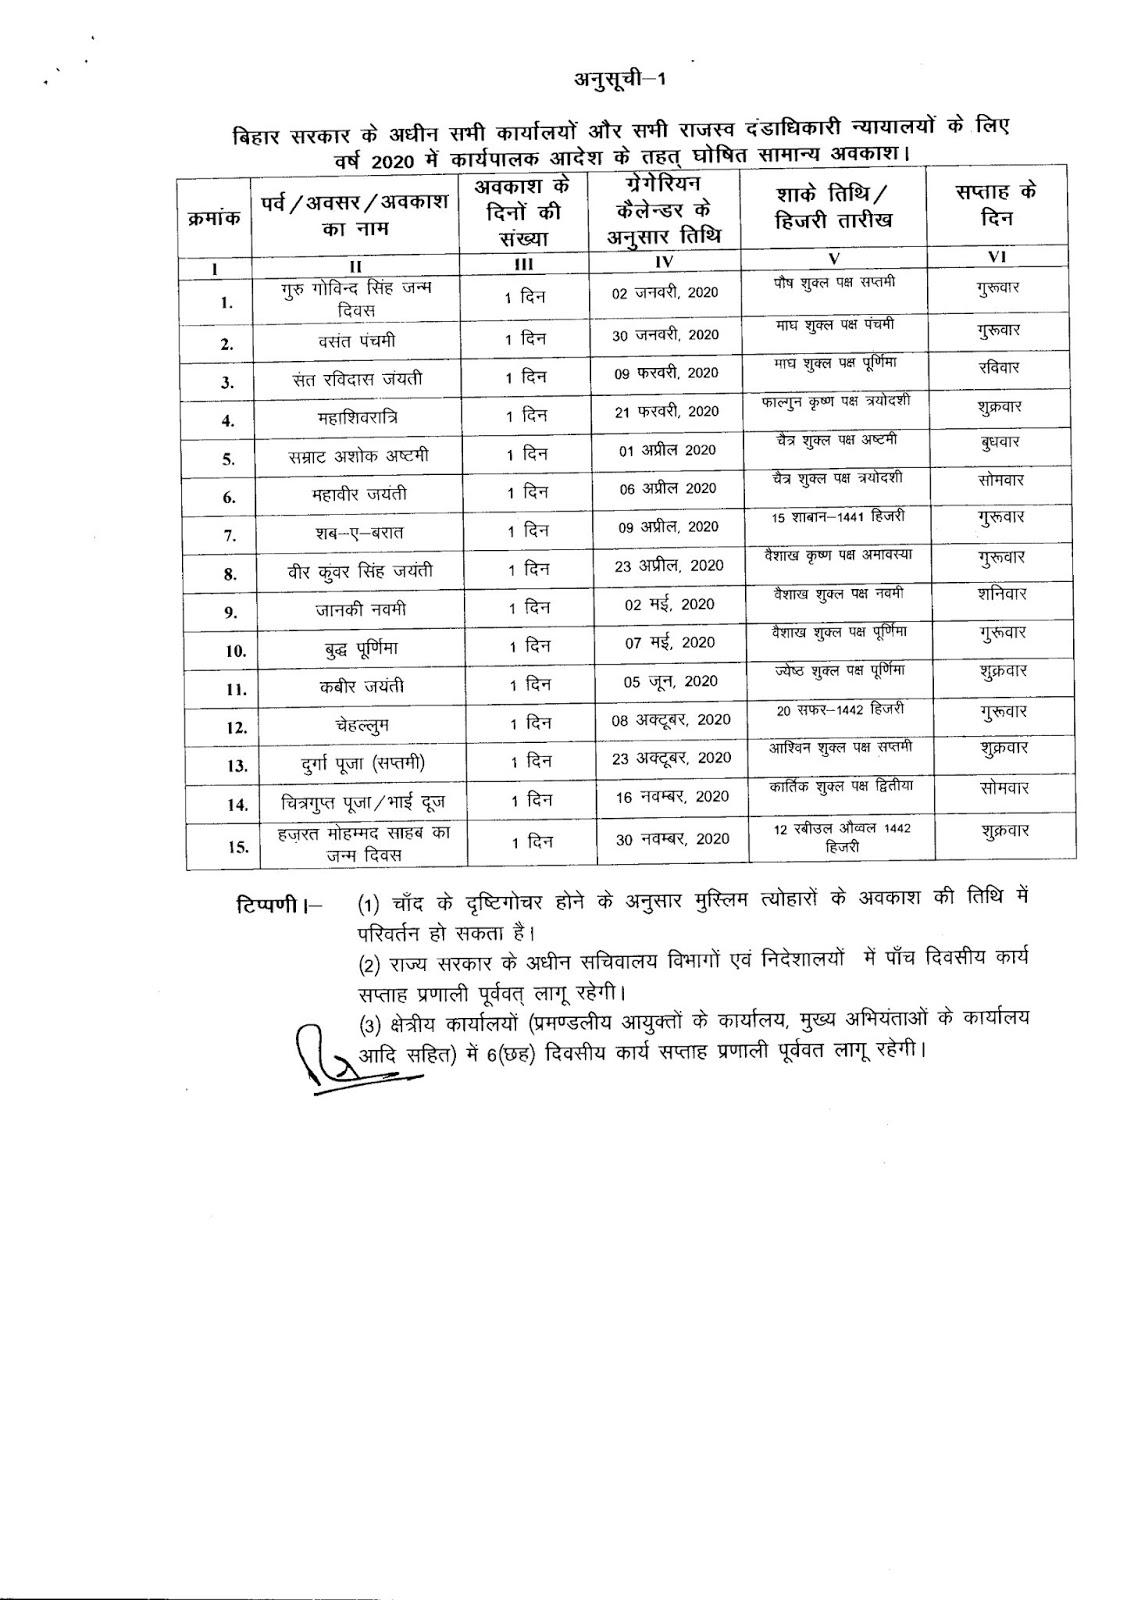 Bihar Government Calendar 2020 #educratsweb for Bihar Sarkar Calendra 2020